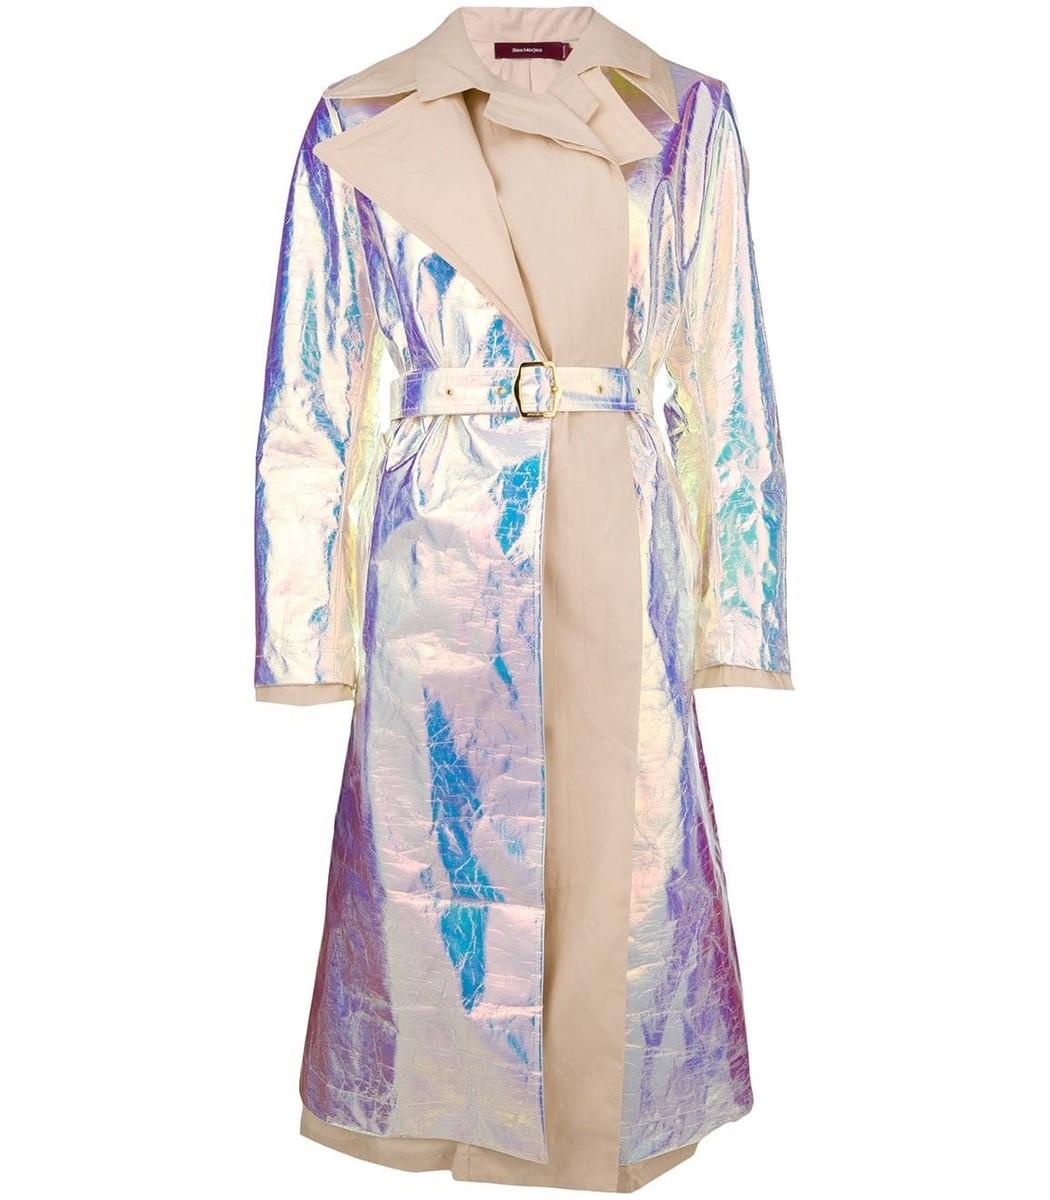 Sies Marjan Devin Iridescent Trench Coat